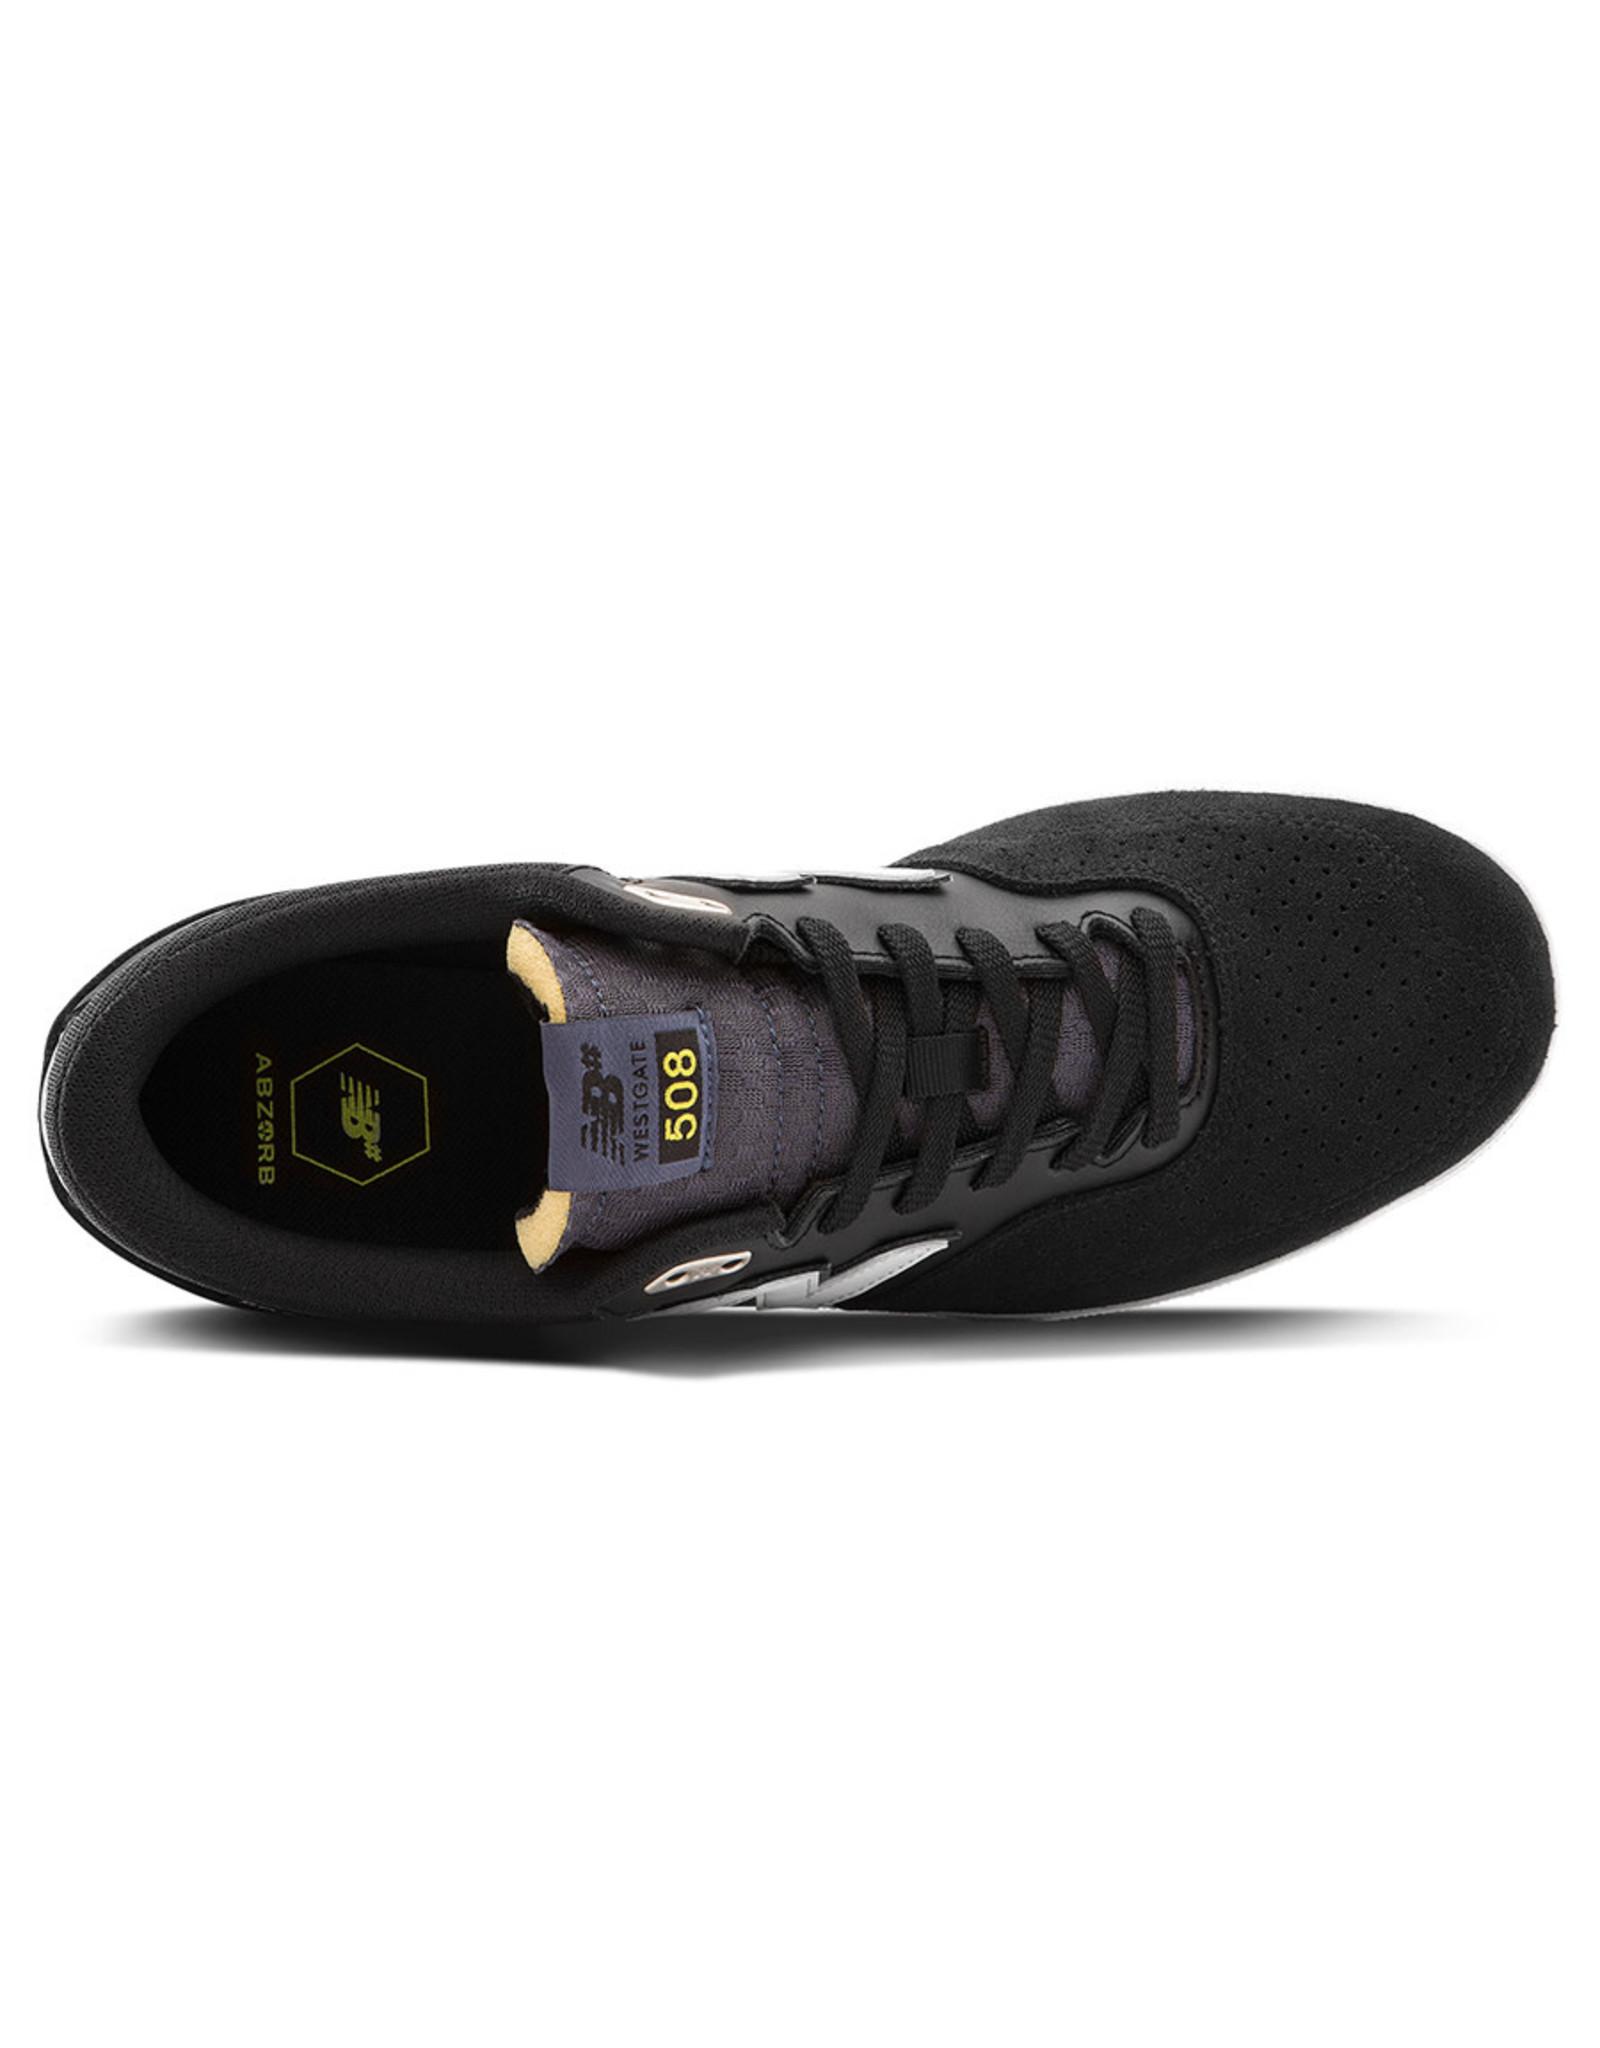 New Balance Numeric New Balance Numeric Shoe 508 Brandon Westgate (Black/Navy)